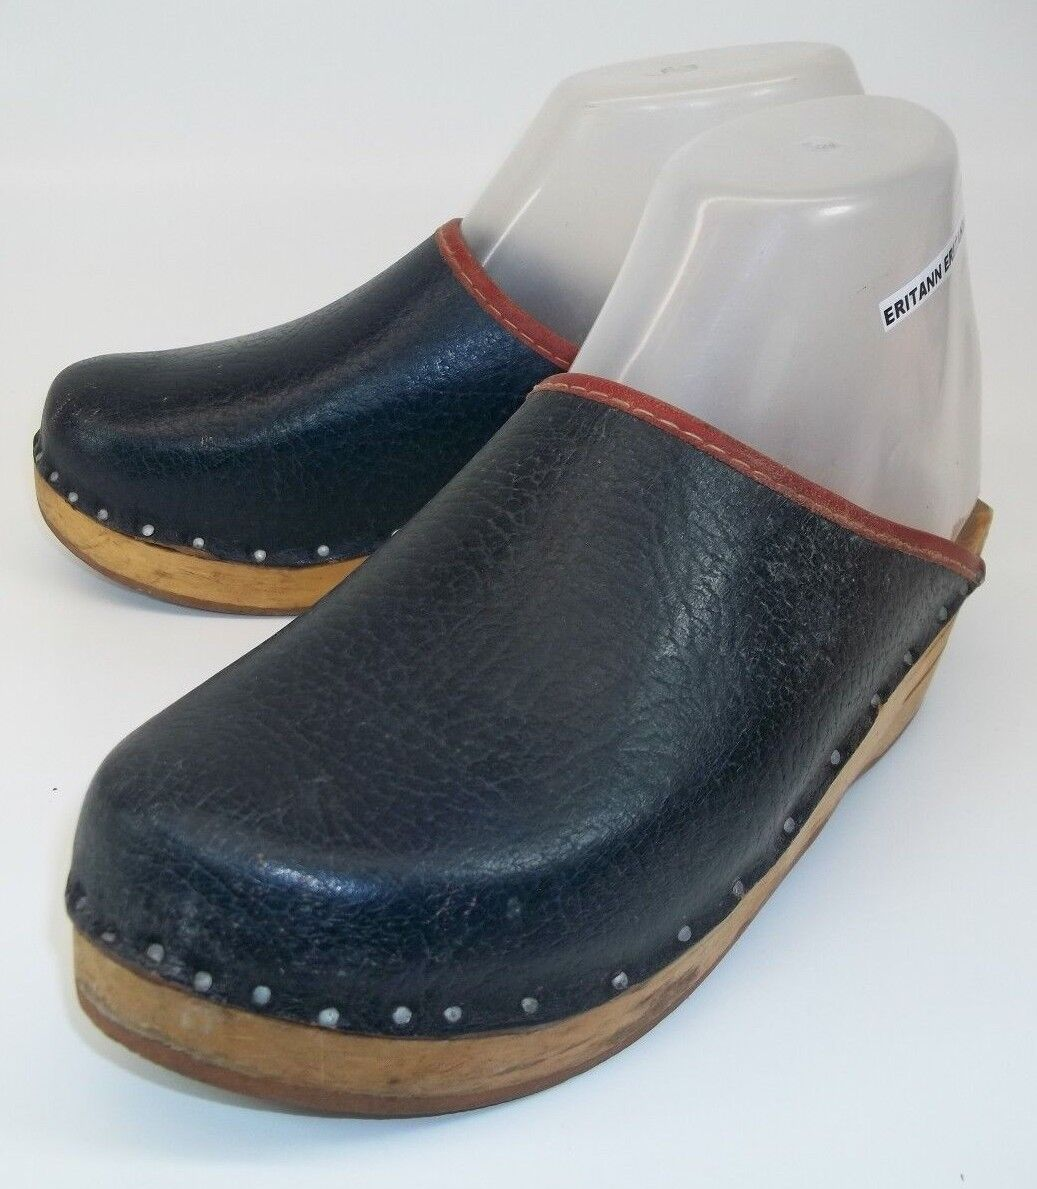 Klinik Wos Shoes Clog Mule EU36 Blue Leather Wood Heel Wedge Slip-on nailed 13